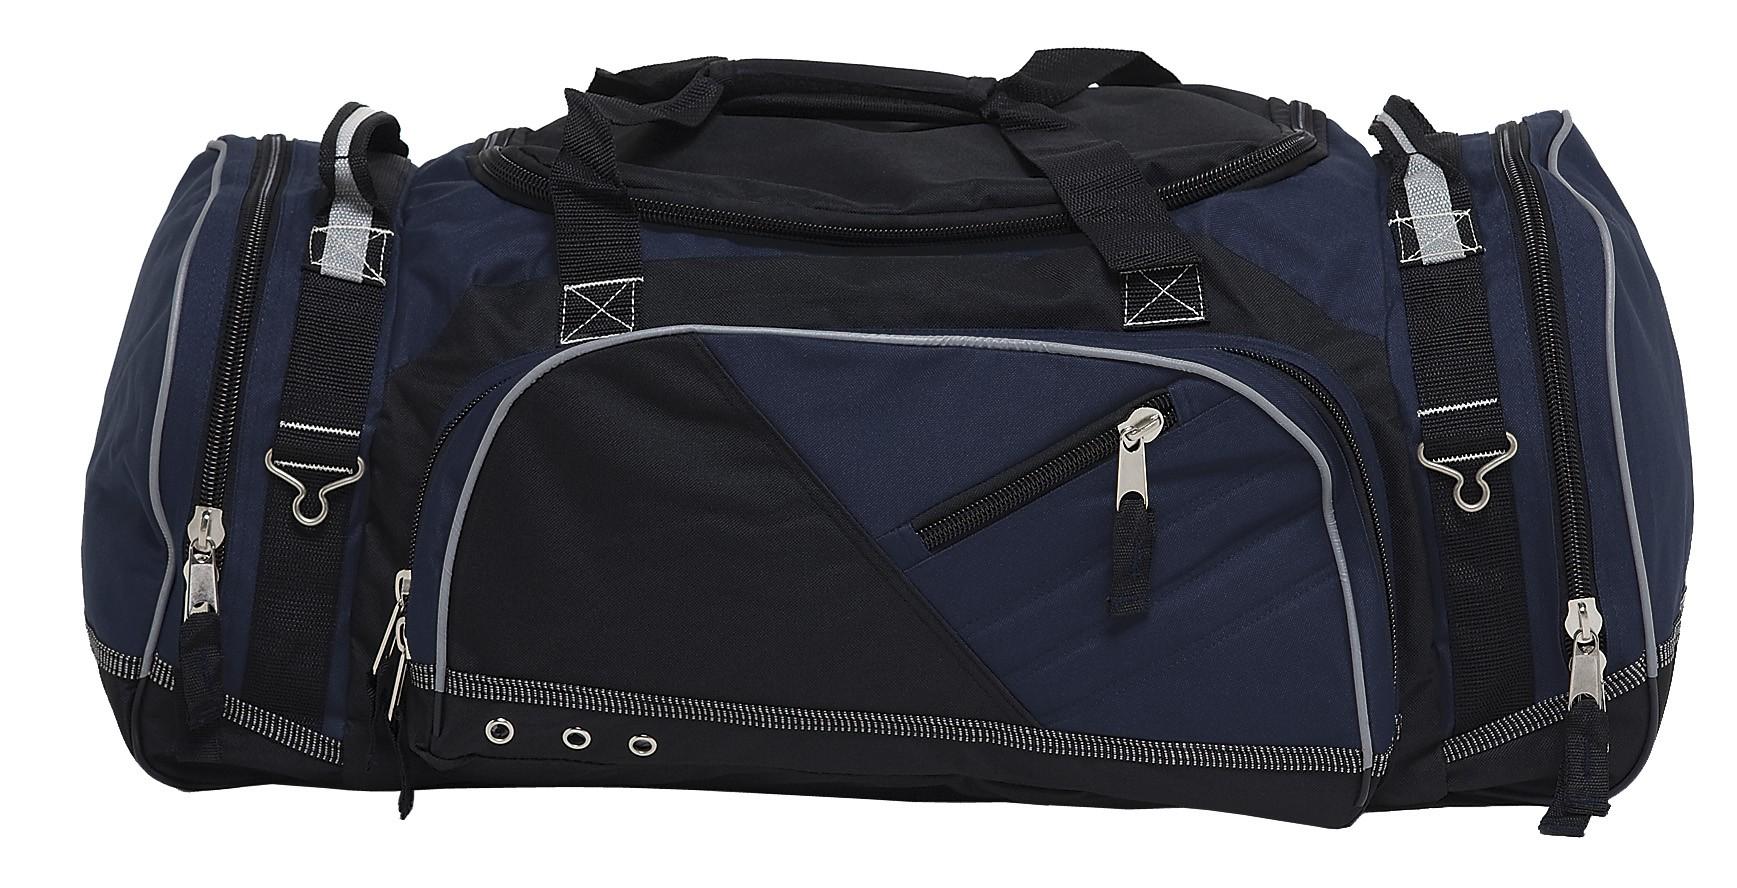 Recon Sports Bag - Black & Navy